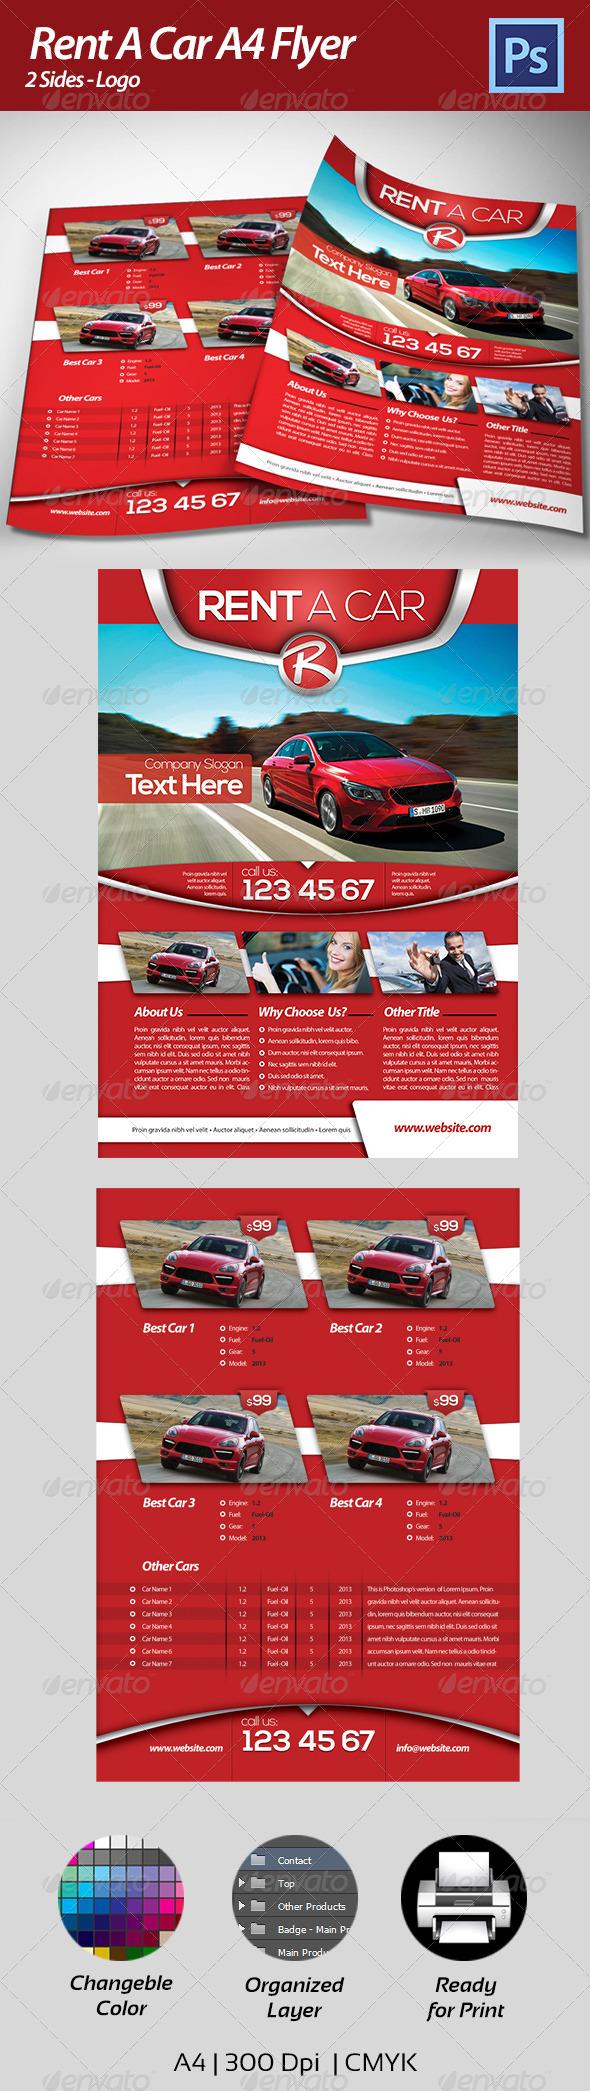 GraphicRiver Rent a Car Flyer 4396488